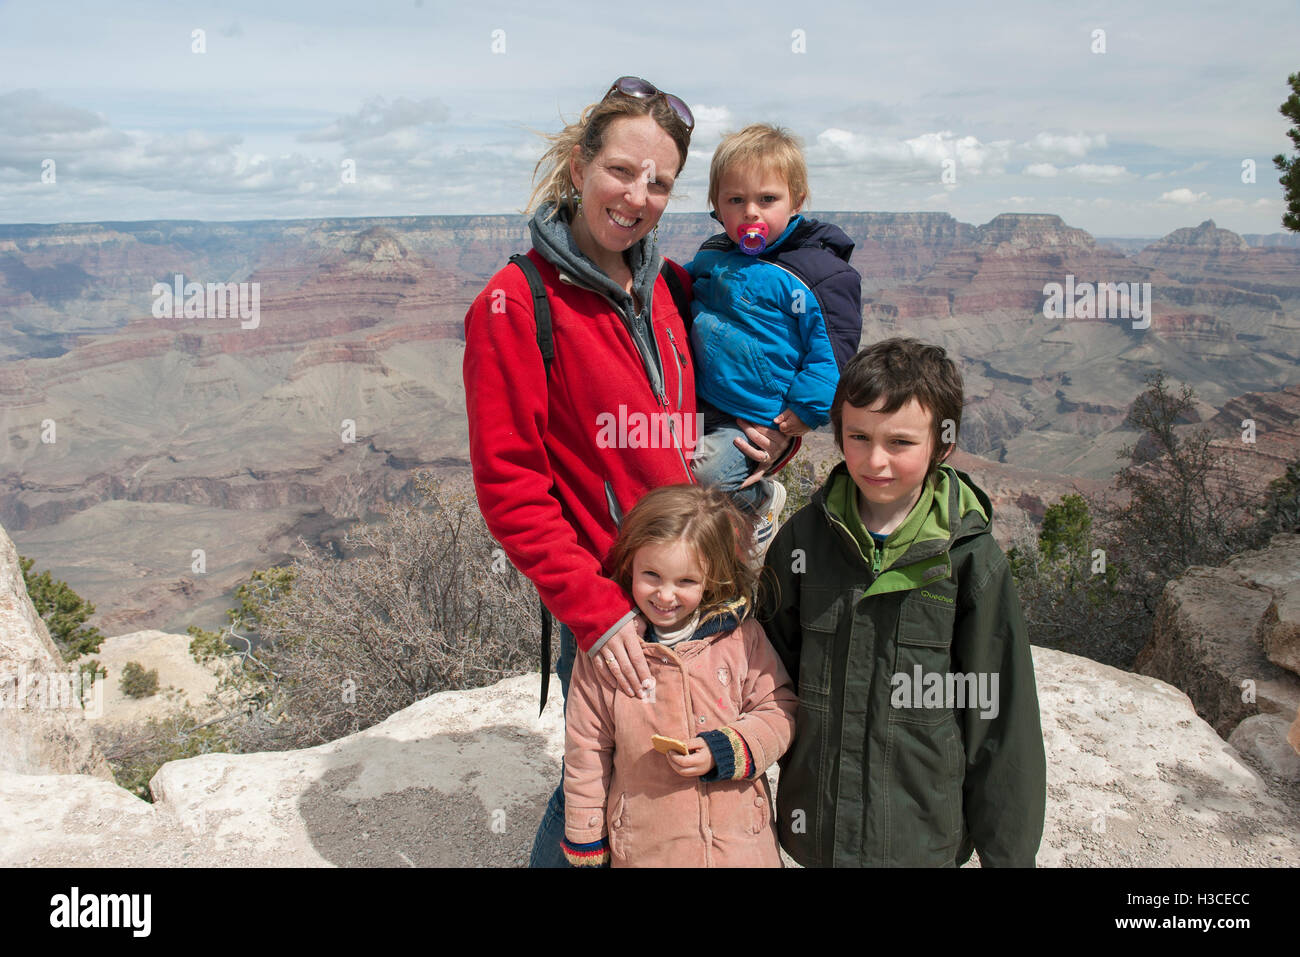 Mutter und Kinder am Grand Canyon in Arizona, USA Stockfoto